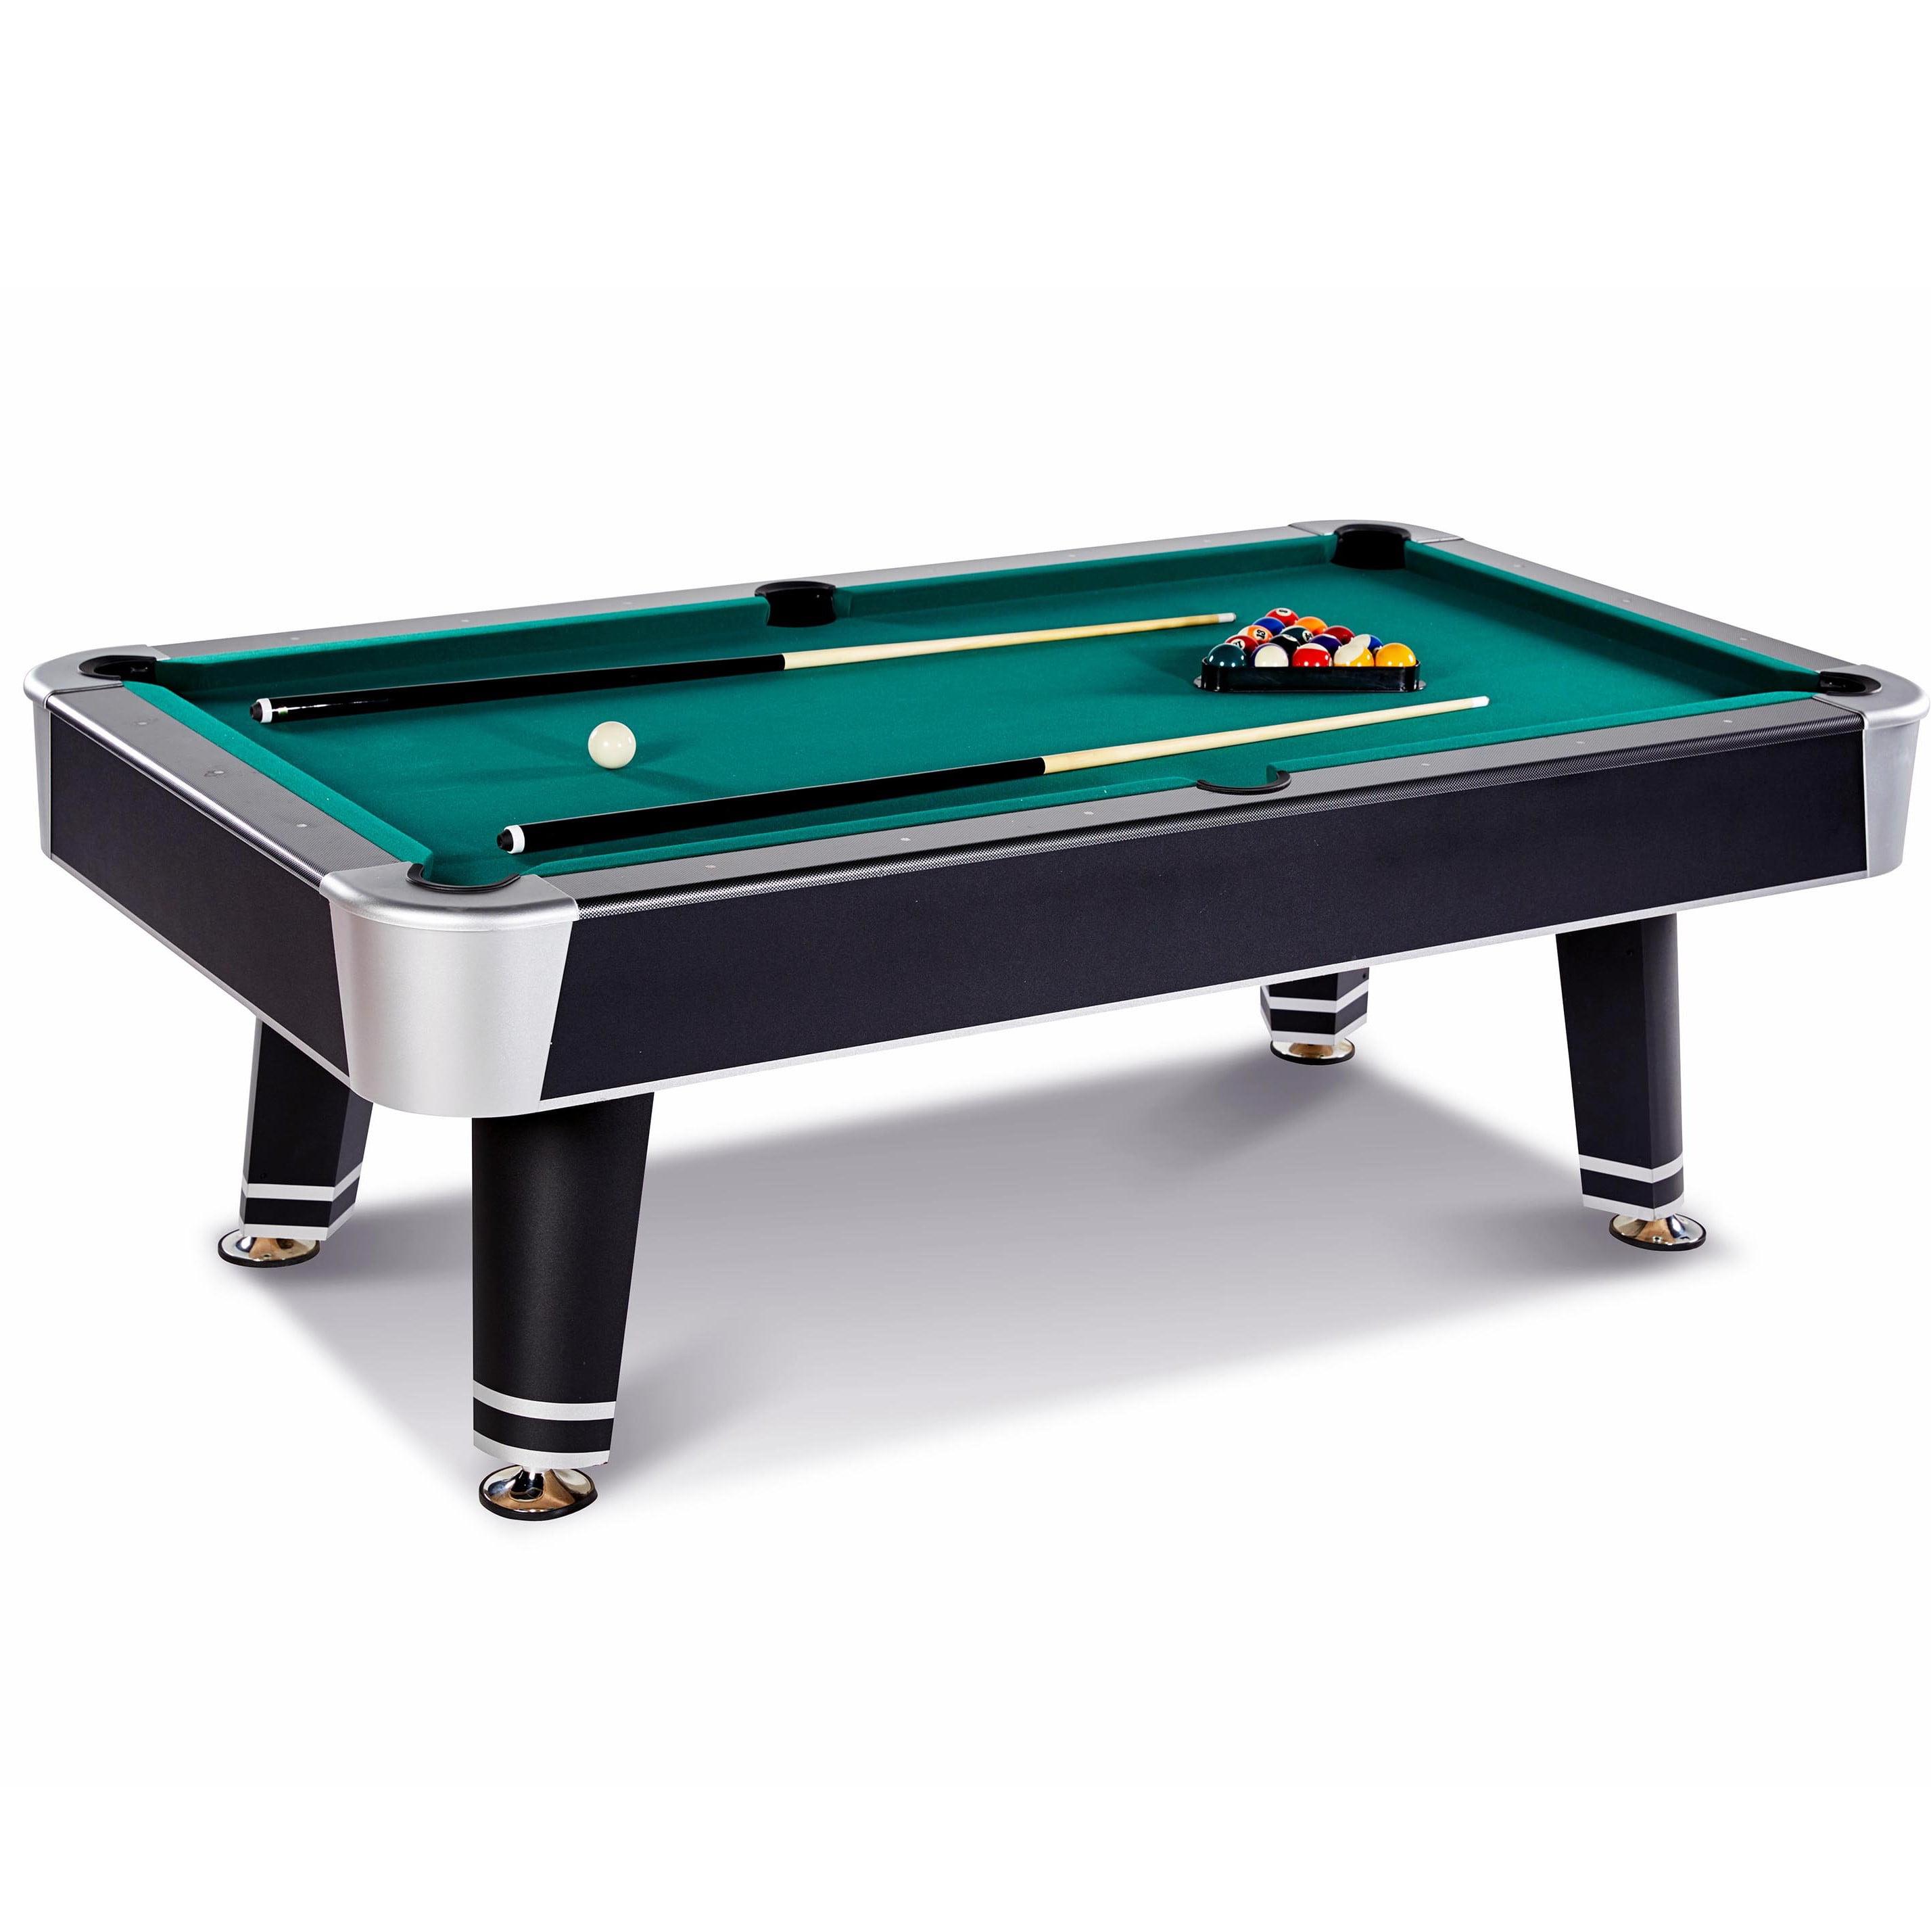 Barrington 7 5 Ft Arcade Billiard Table with Cue Set & Accessory